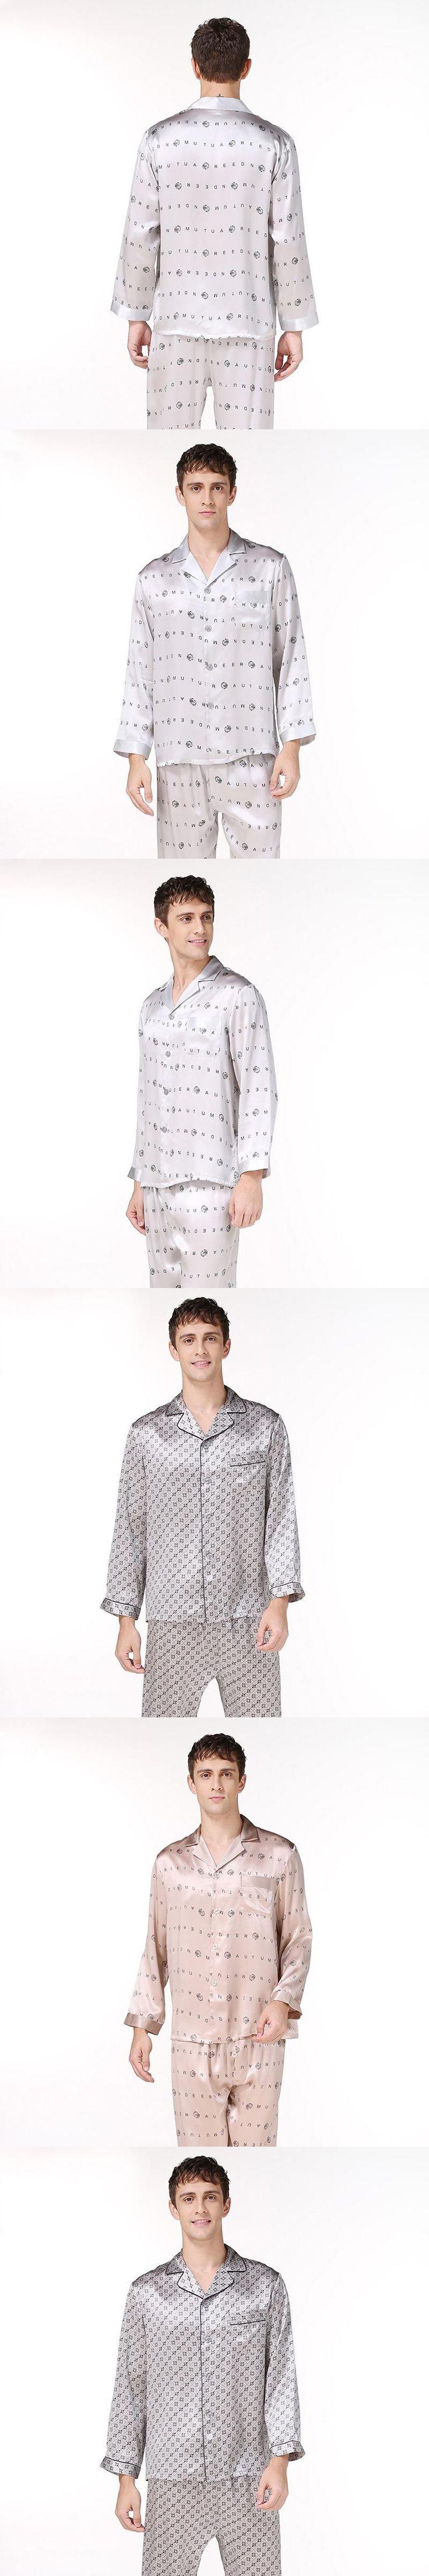 2XLmens silk pajama set letter long sleeve  mens silk night sleepwears brand men's silk stain summer fashion casual pajama sets